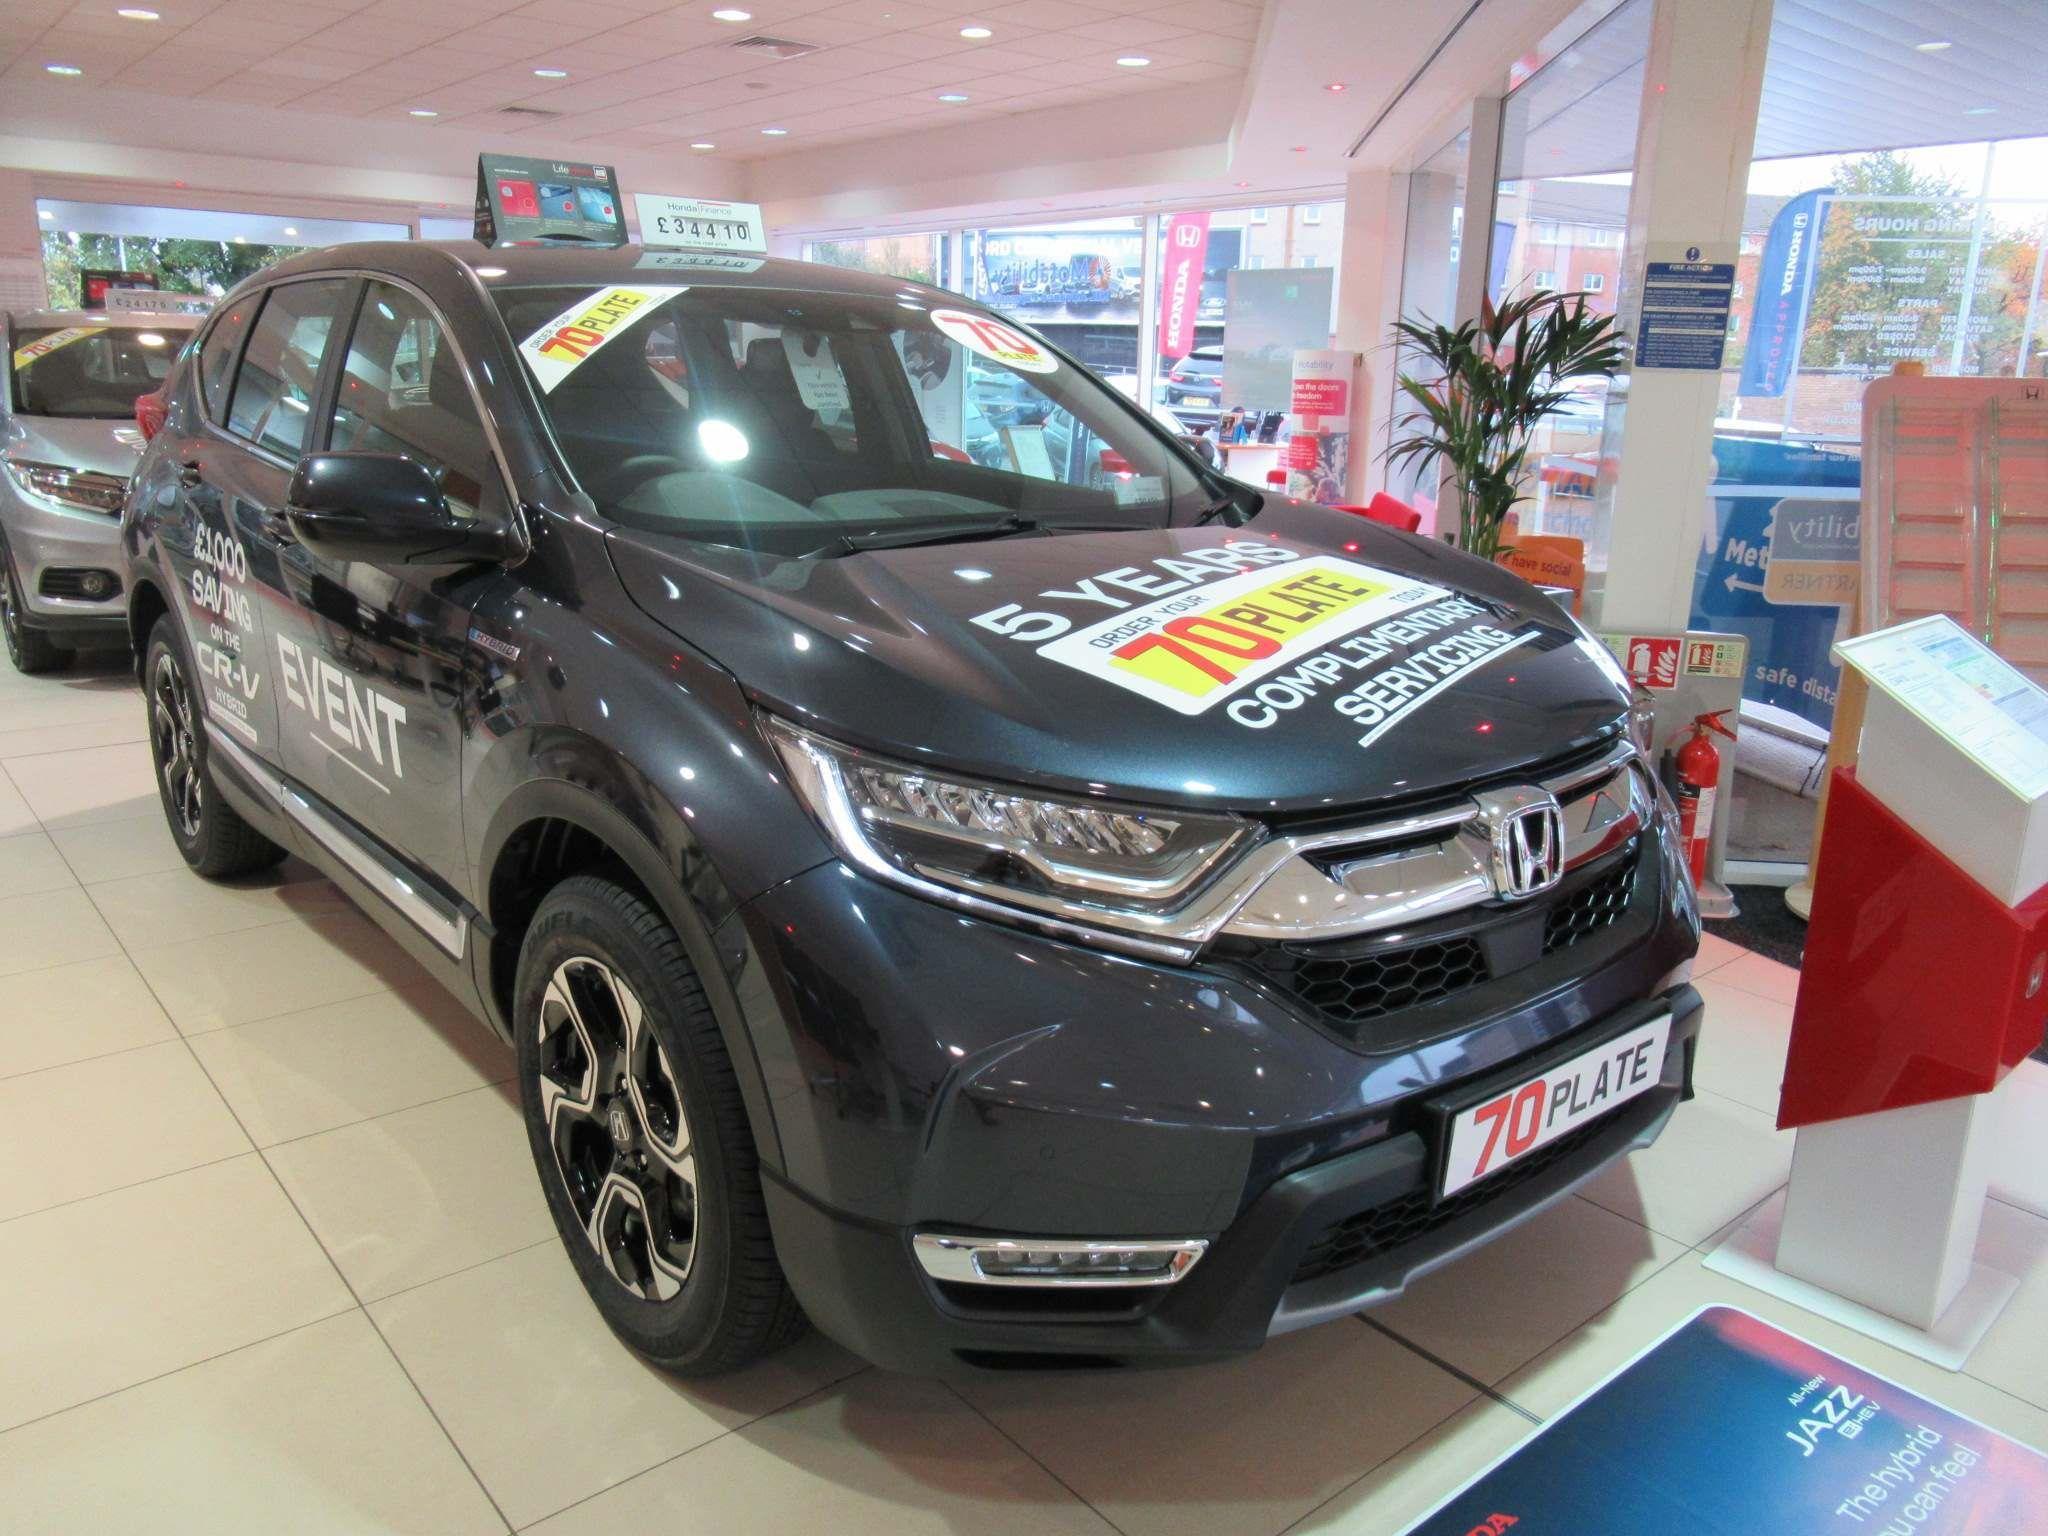 Honda CR-V 2.0 h i-MMD SE eCVT 4WD (s/s) 5dr